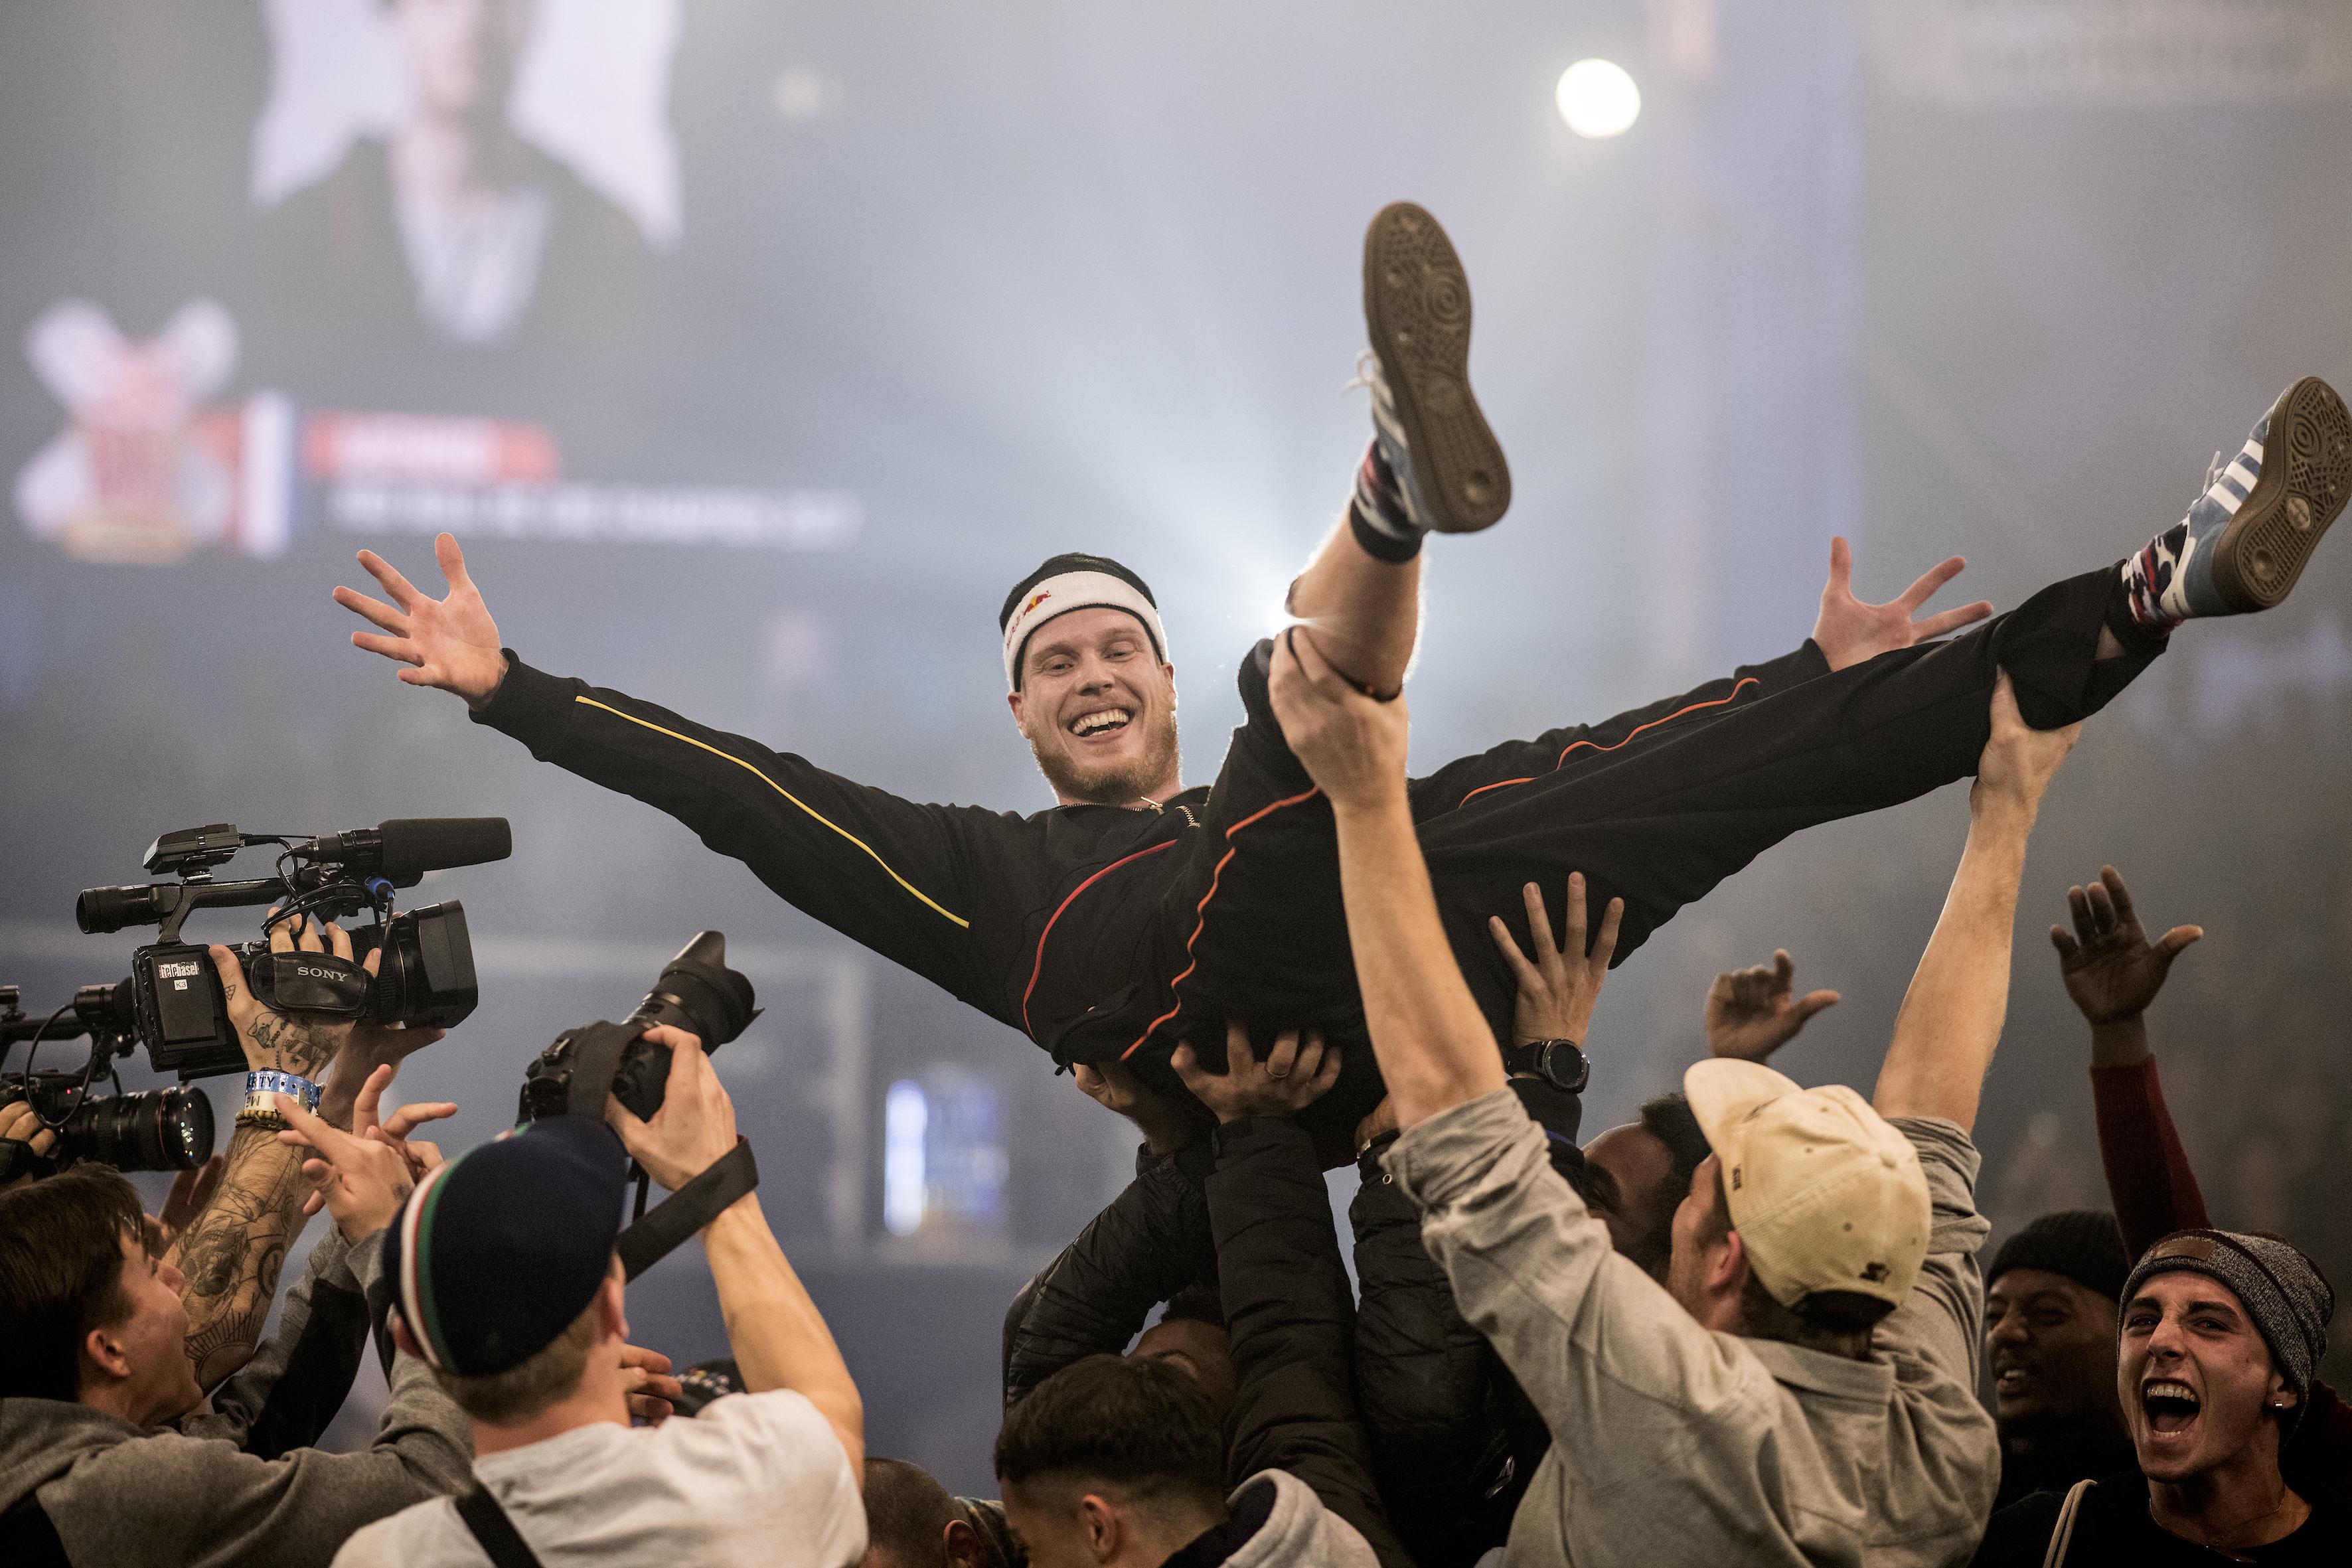 Amsterdam wordt gek: Menno wereldkampioen breakdance